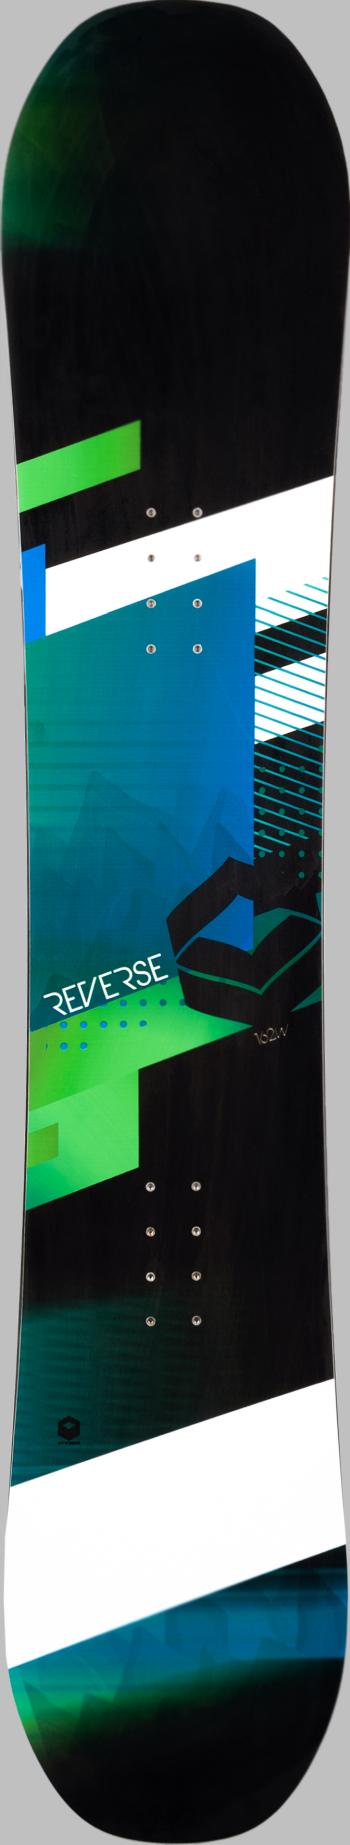 Reverse green - Top